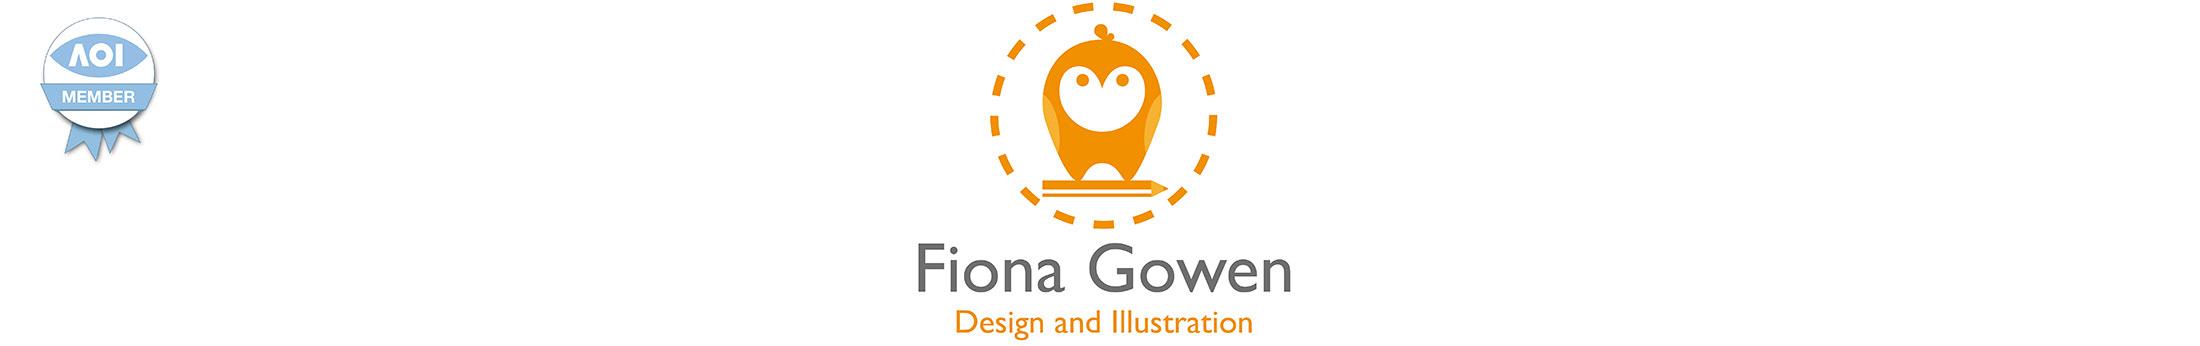 Fiona Gowen